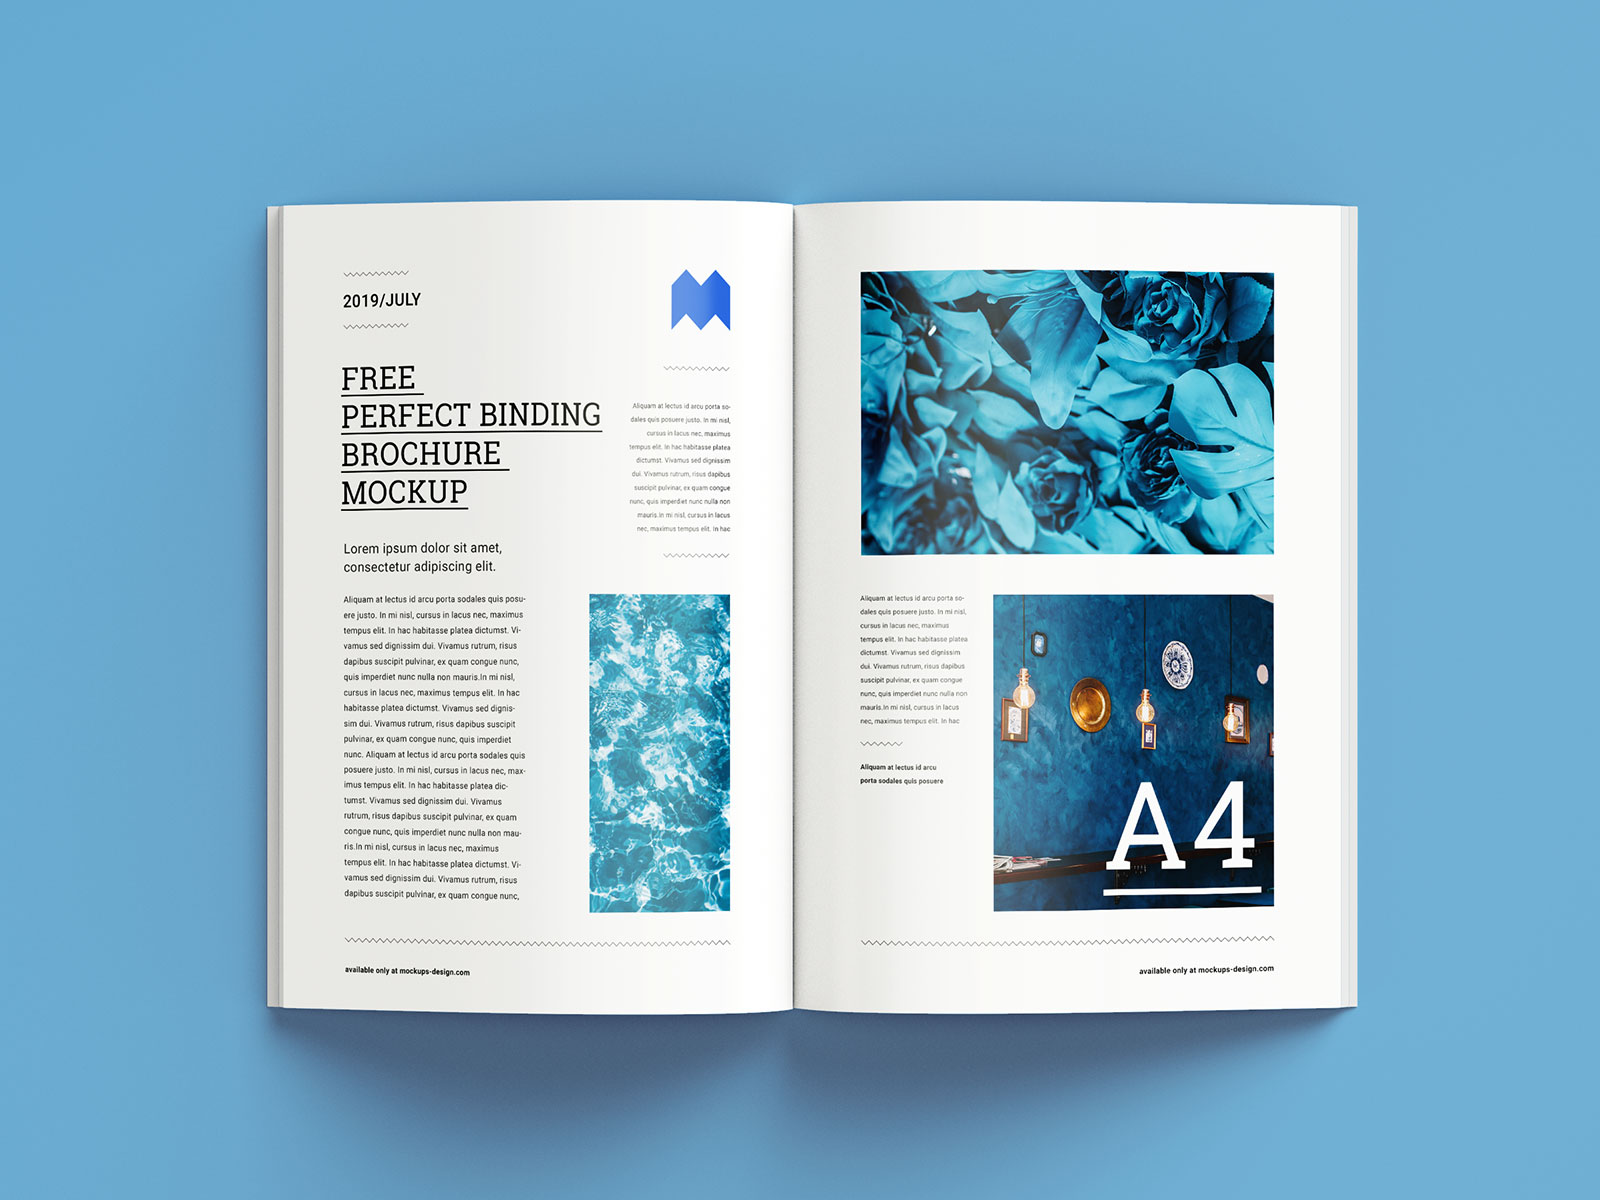 Free A4 Brochure Magazine Mockup Set (6 PSD Files) (1)